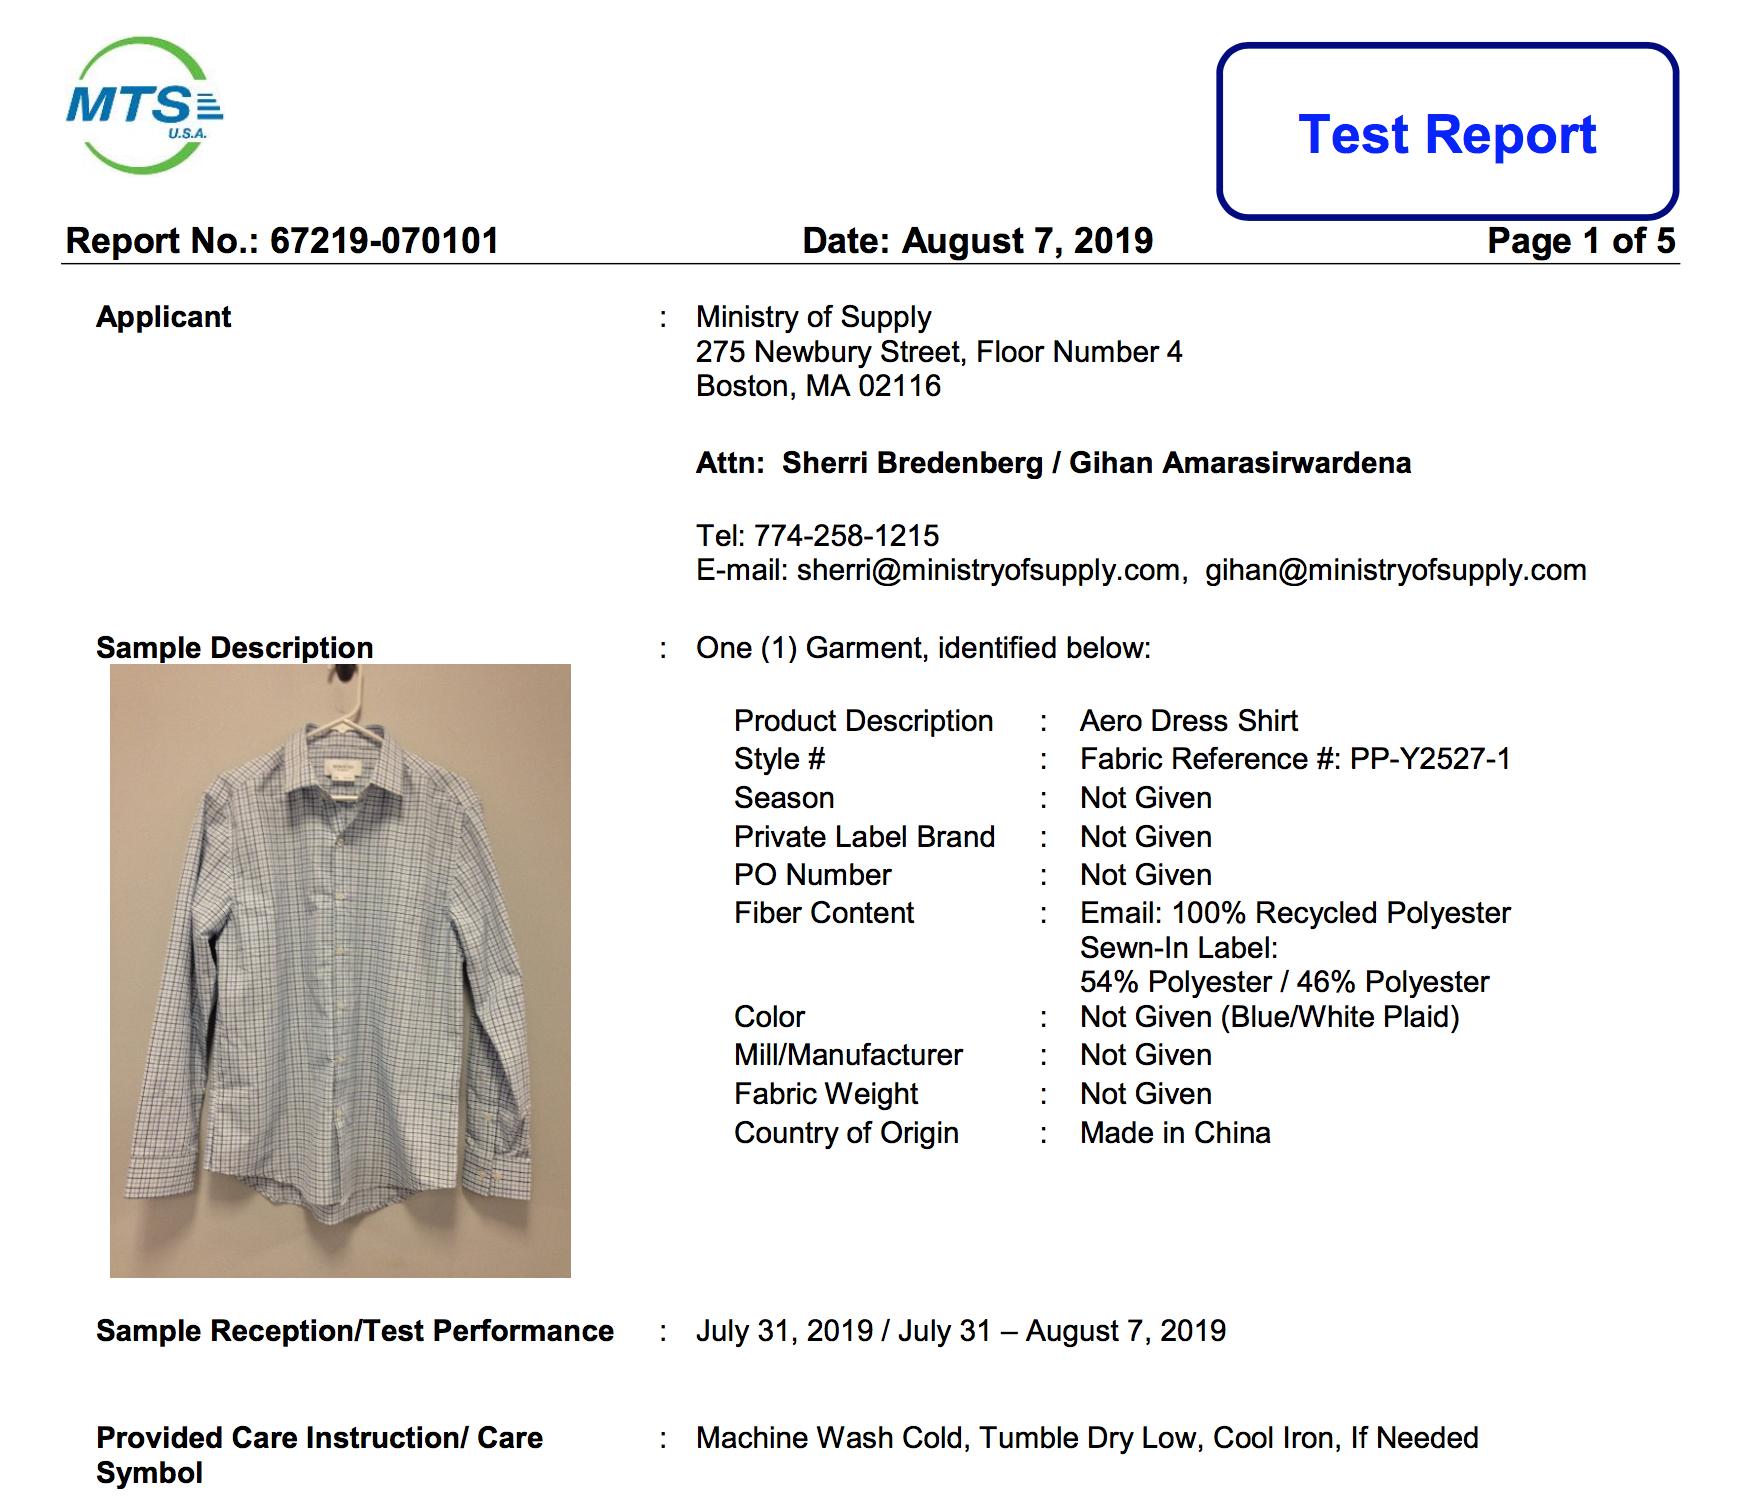 Screenshot 2019-09-05 23.15.20.png